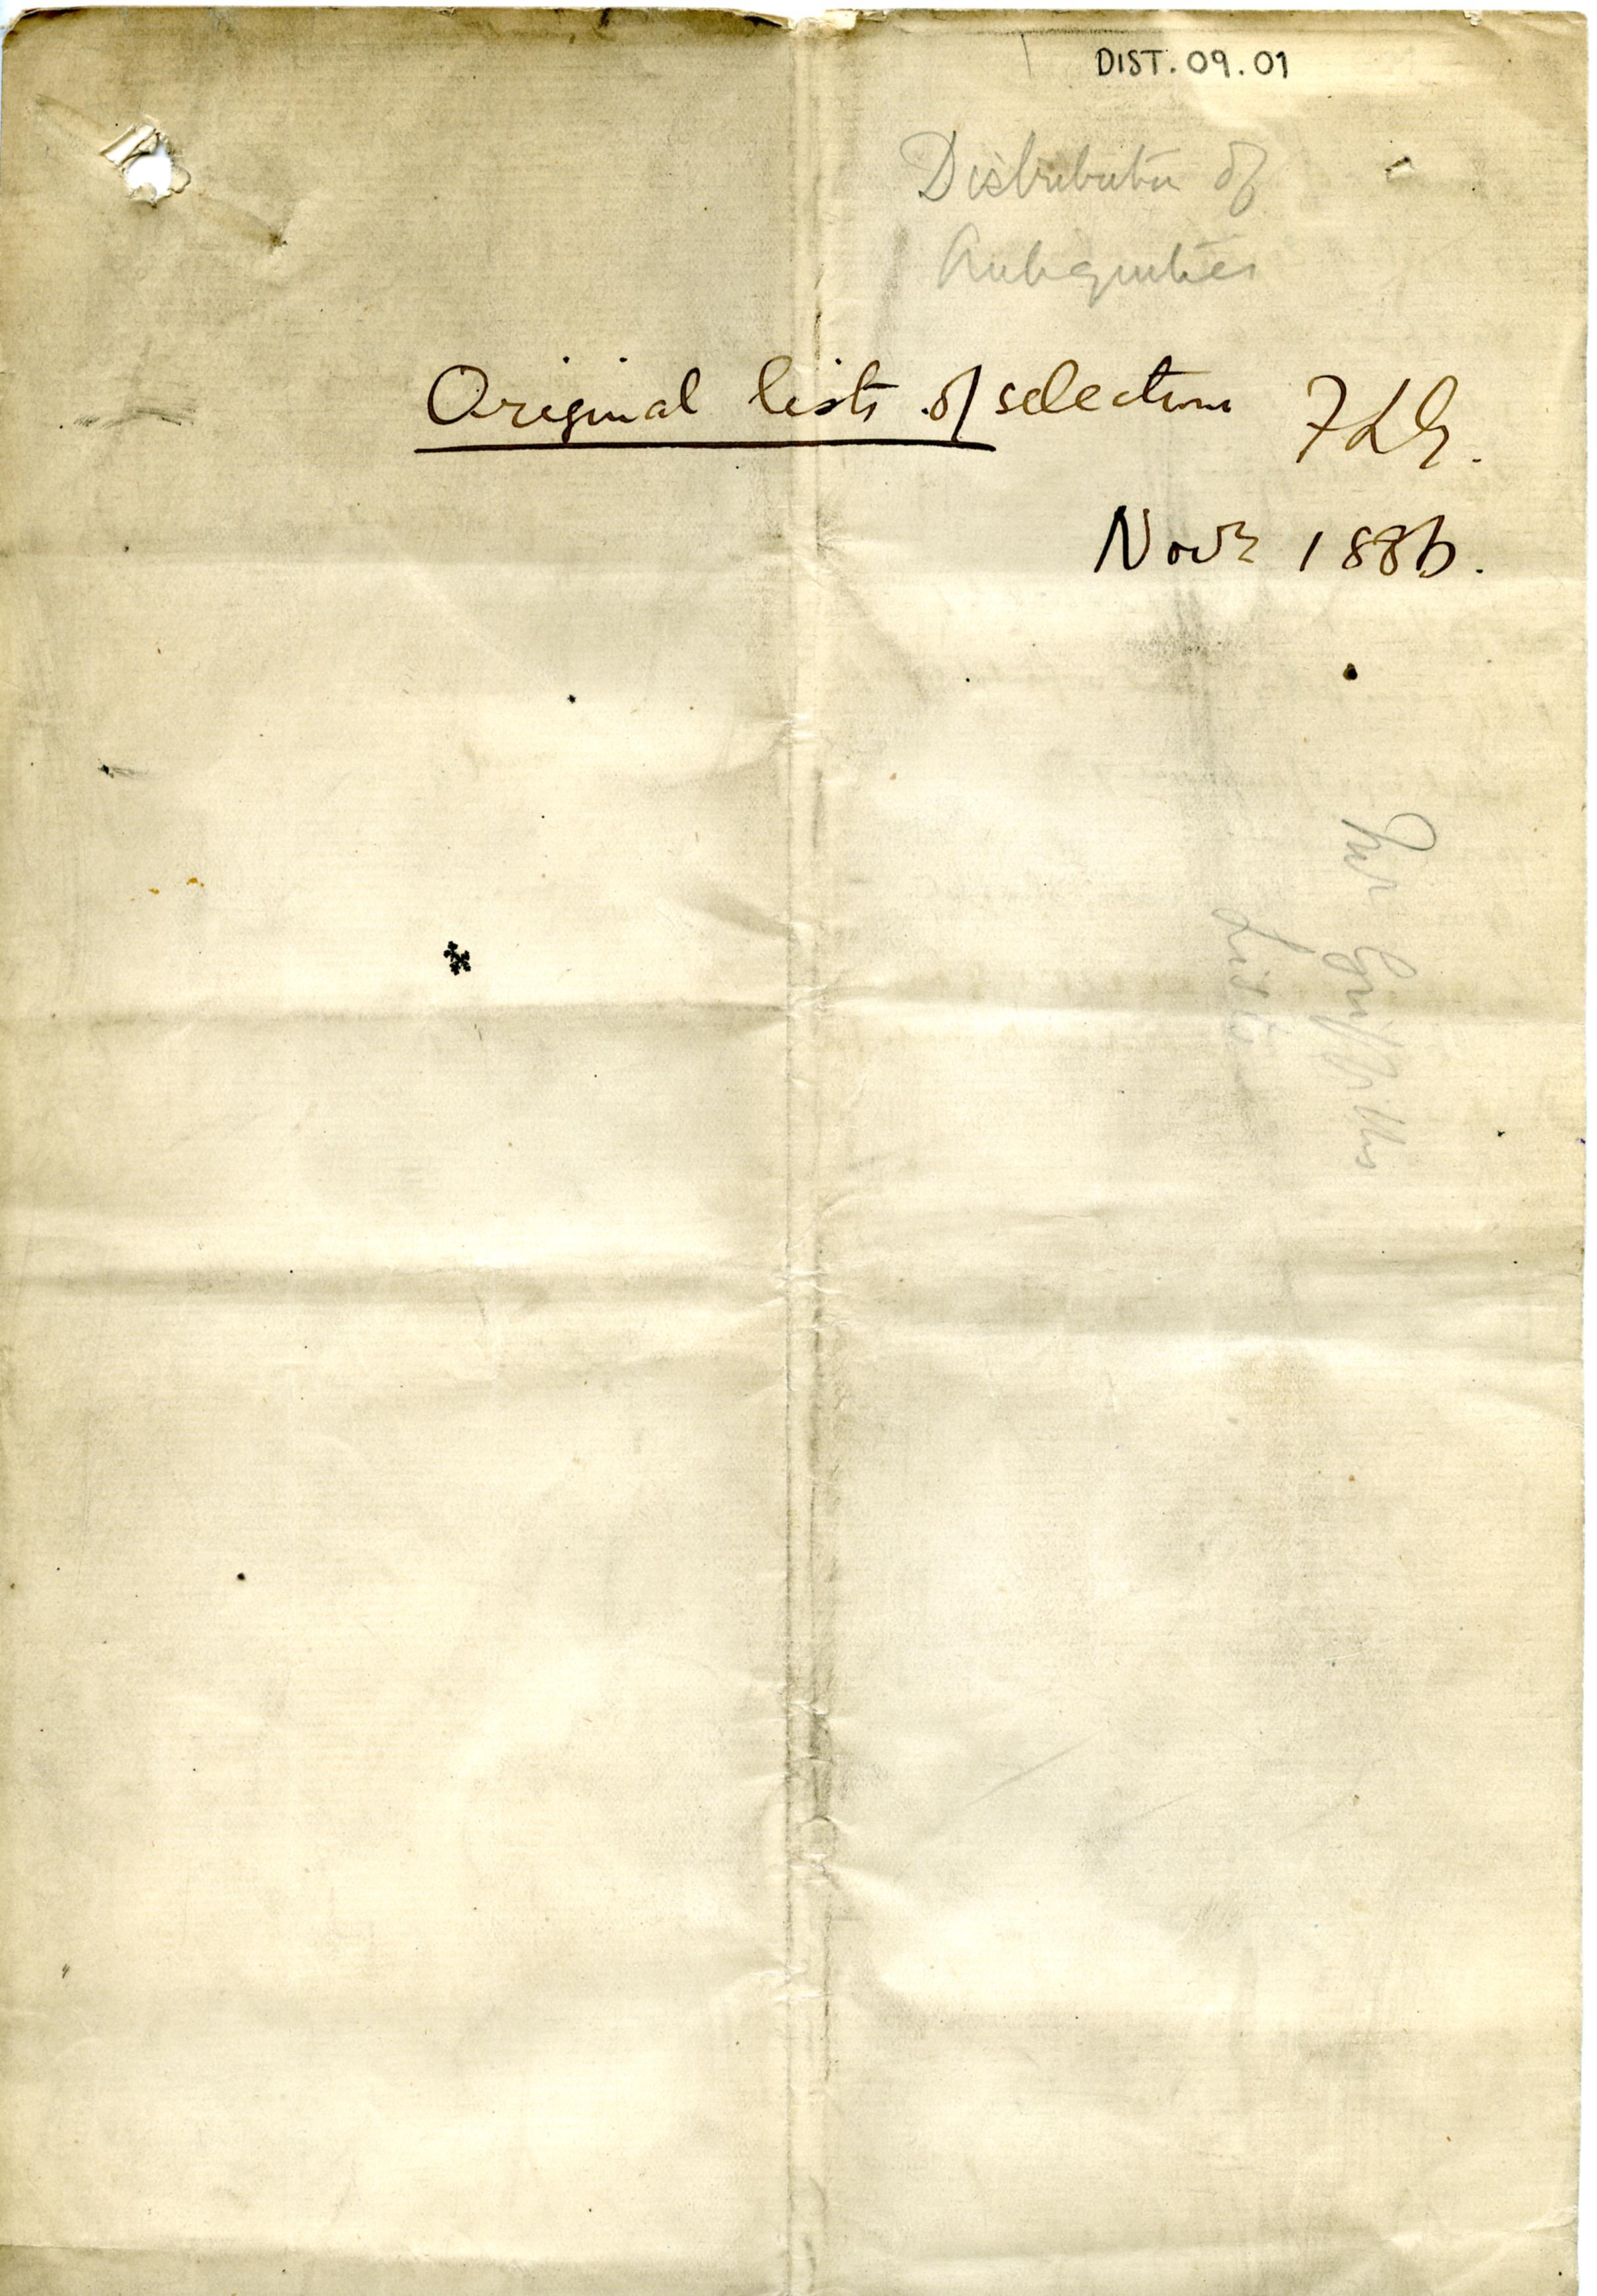 1886 Nebesheh Tell Dafana Distribution List DIST.09.01a